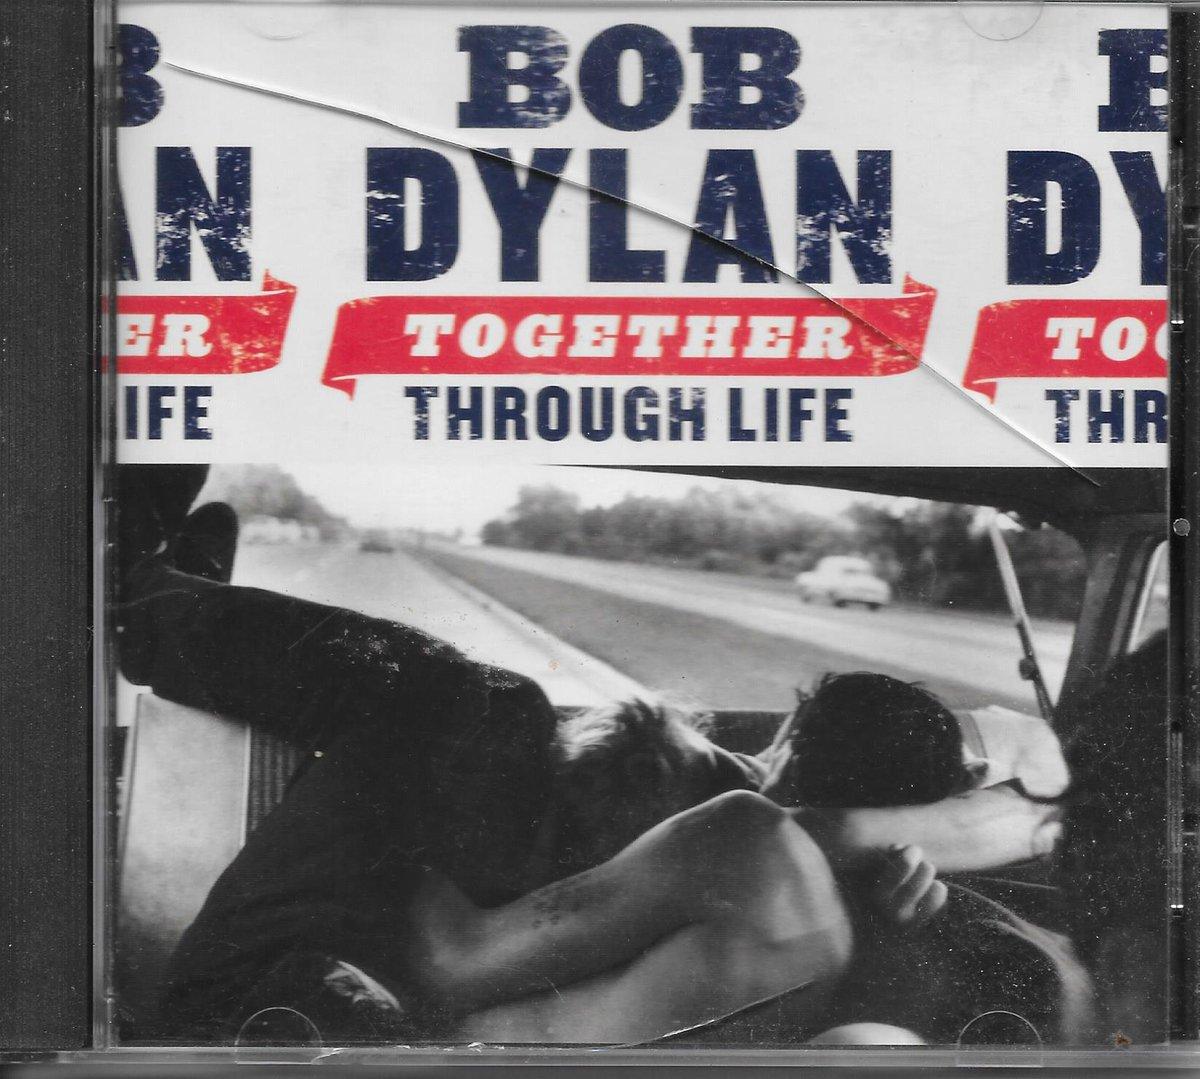 Latest addition to my #etsy shop: Bob Dylan - Together Through Life - Bob Dylan Music- CD https://t.co/b333MkbwLL #bobdylan #bloodonthetracks #watchtower #murdermostfoul #vintagebobdylan #bobdylansongs #bobdylanmusic #itaintdarkyet #sweetheartlikeyou https://t.co/jZmknQ4K83